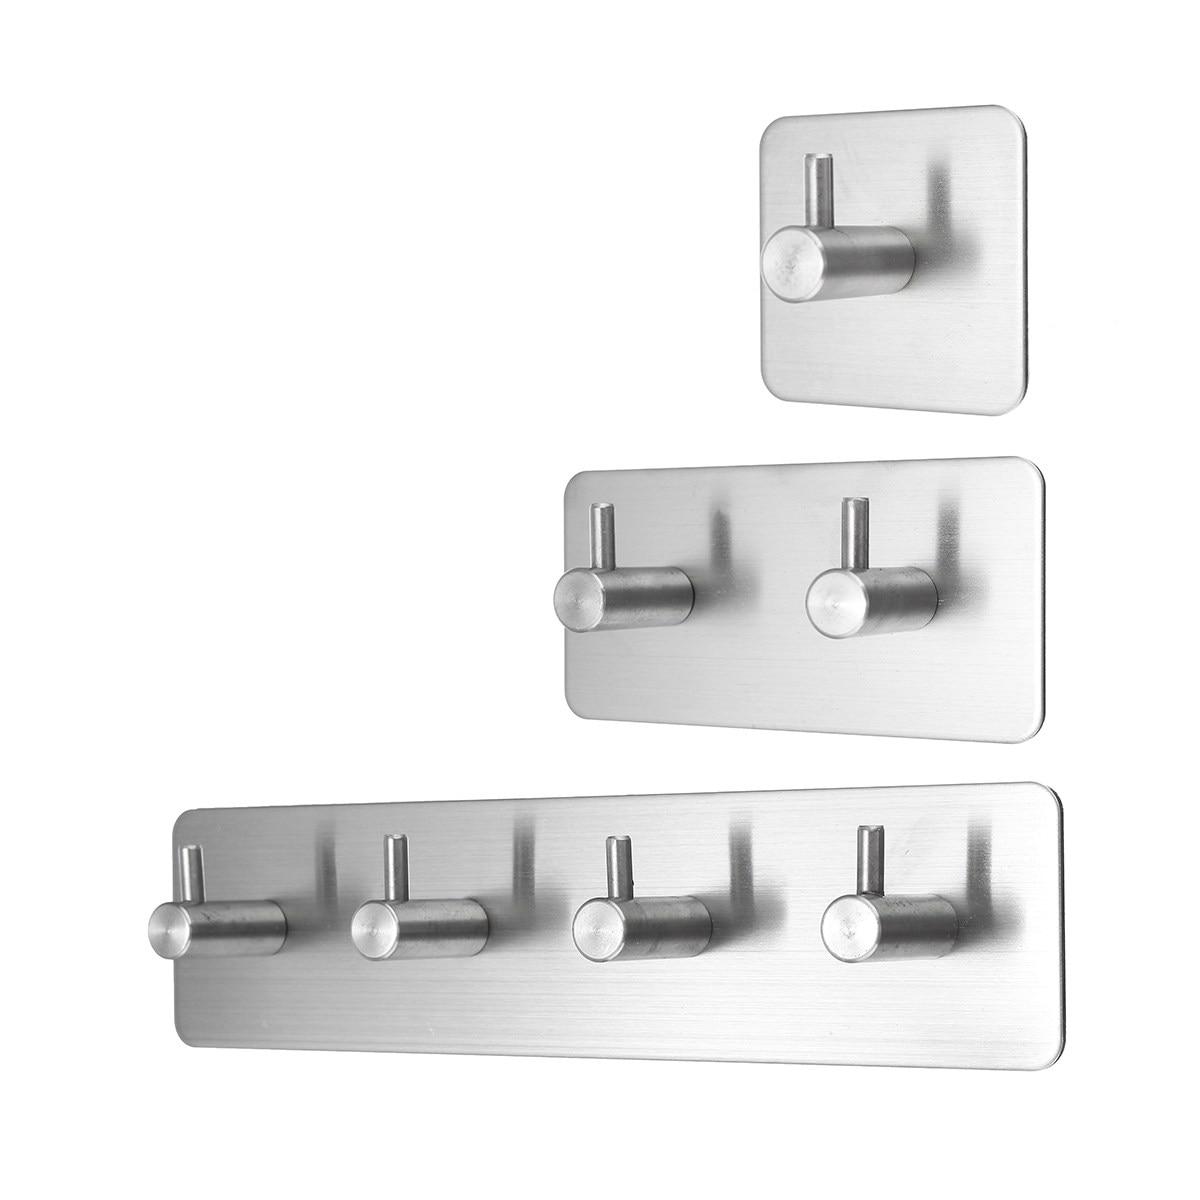 Newest Self Adhesive Wall Door Back Hooks Heavy Duty Stainless Steel Clothes Hanger Bathroom Kitchen Towel Rustproof Hook